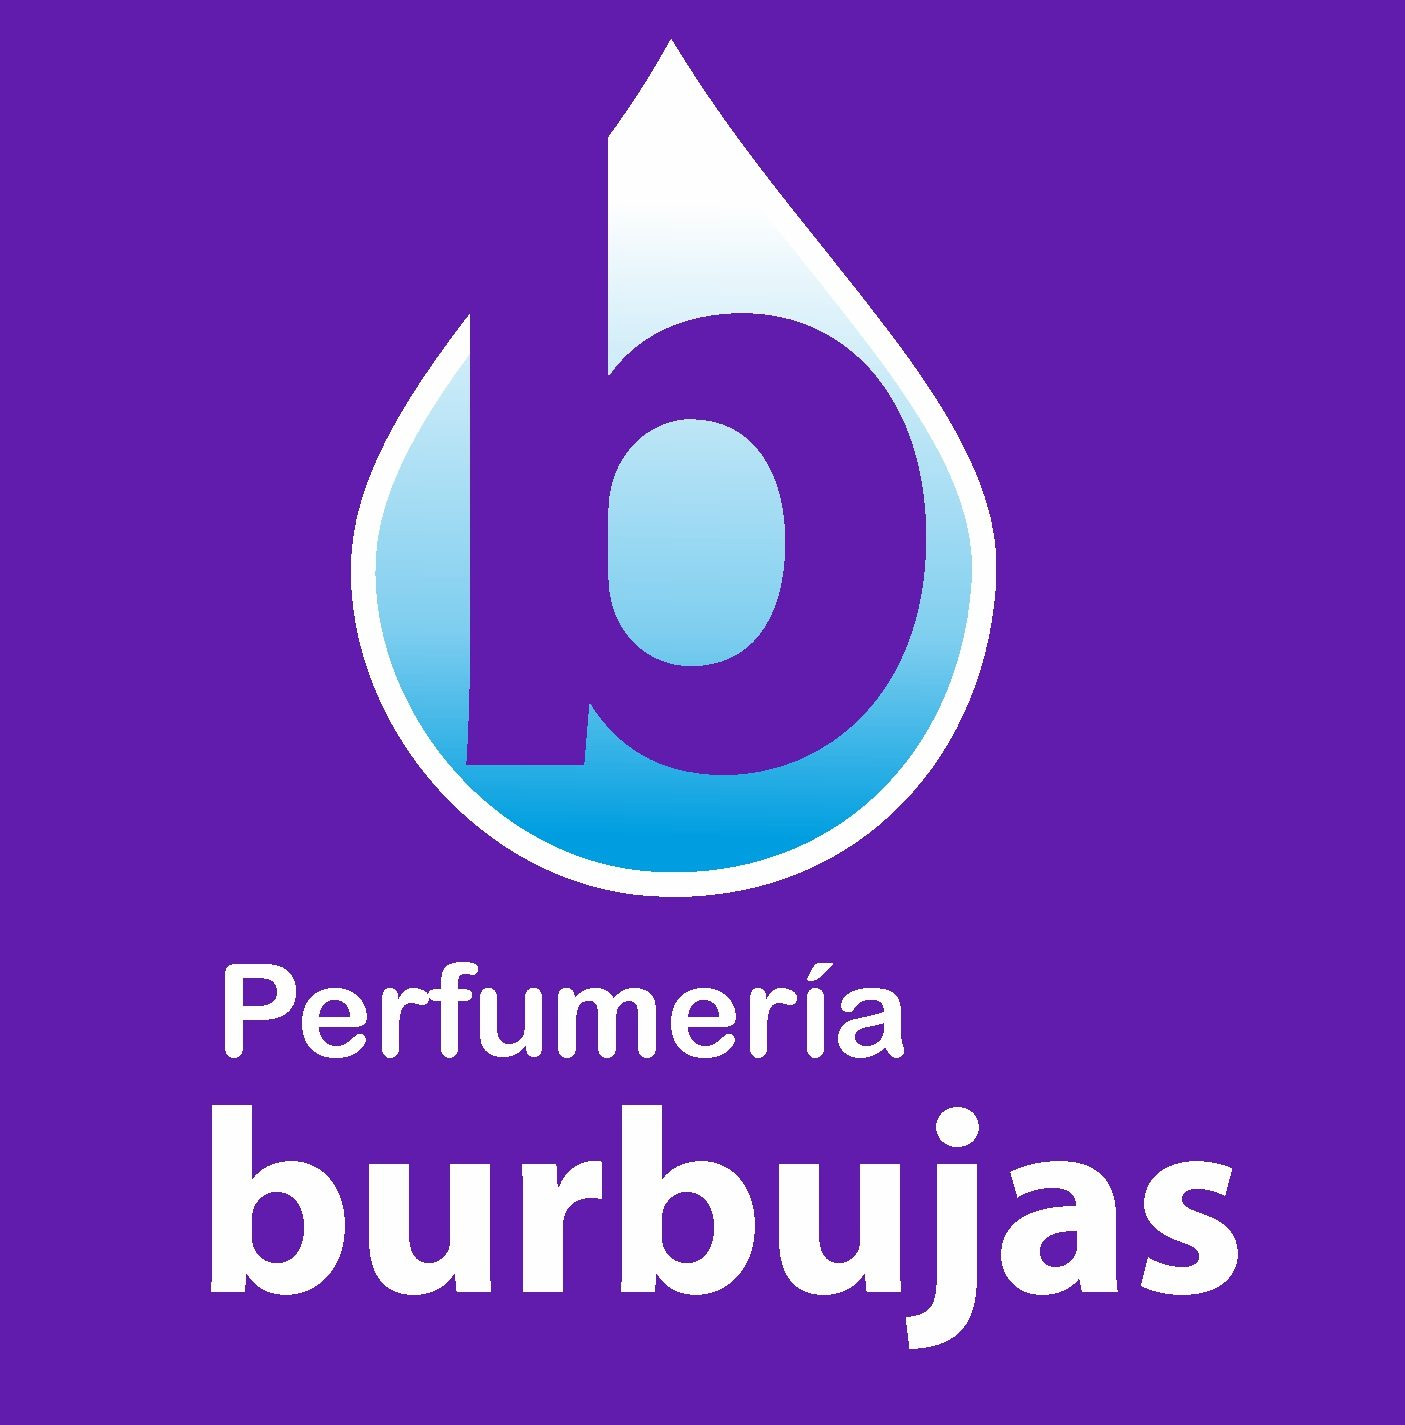 Perfumeria Burbujas